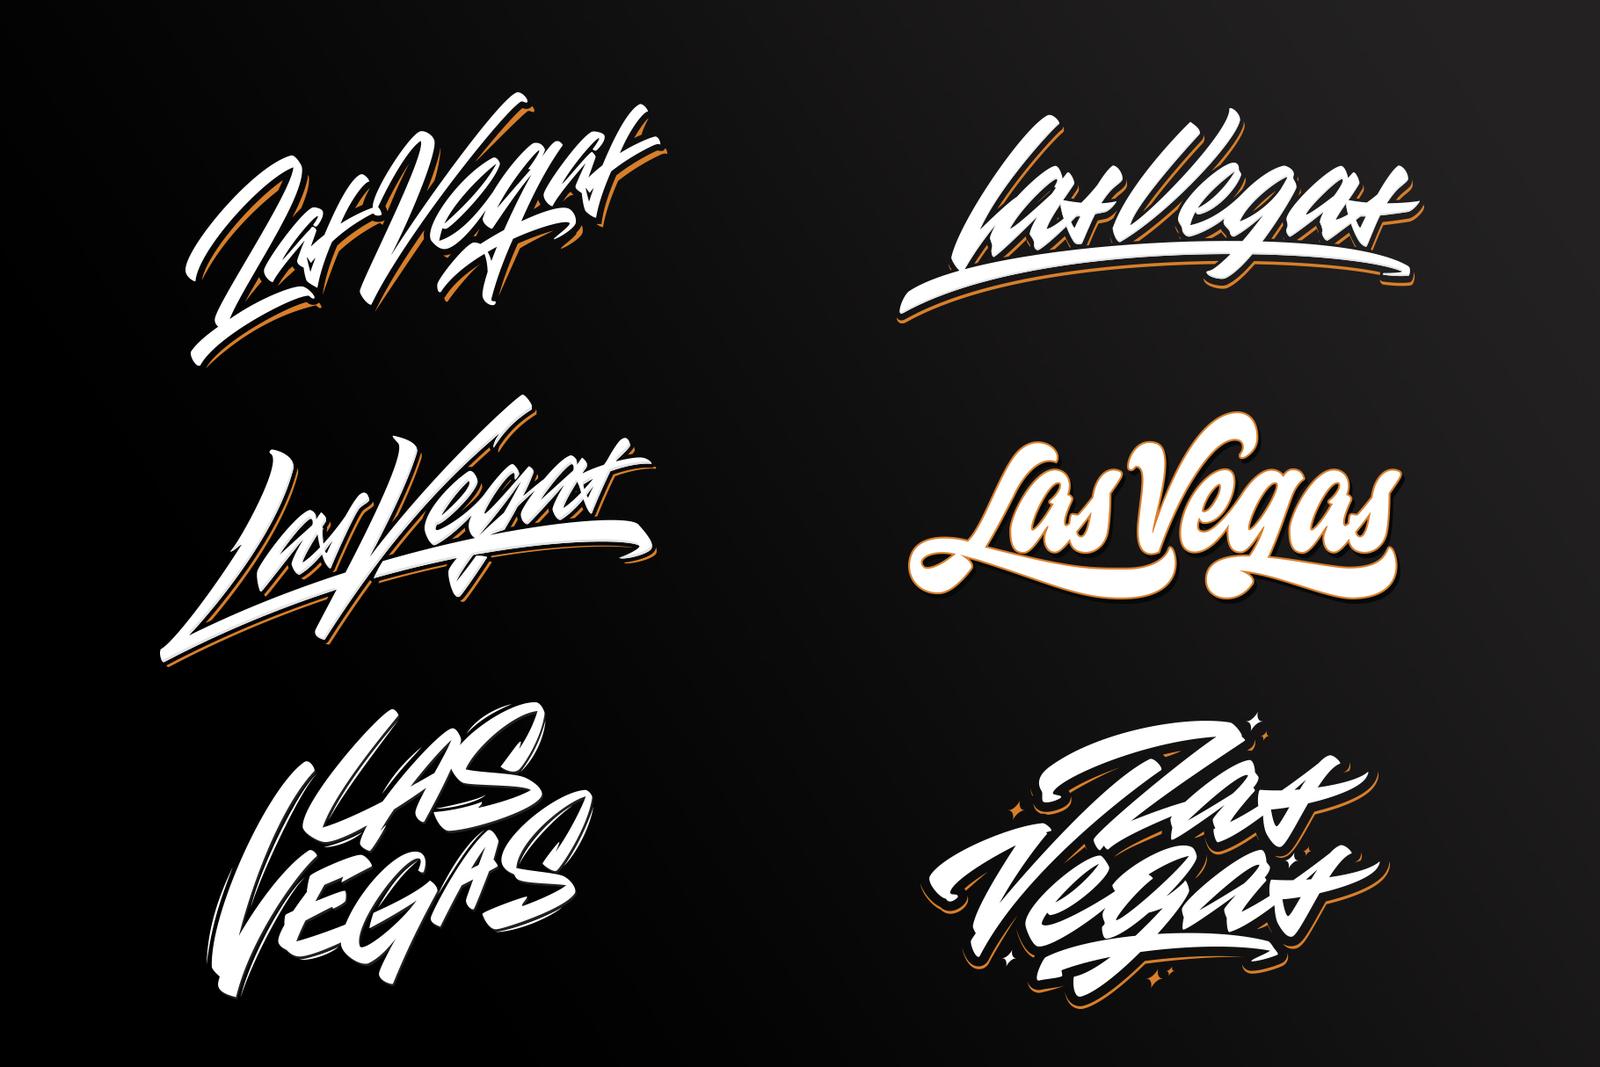 Las Vegas vector lettering